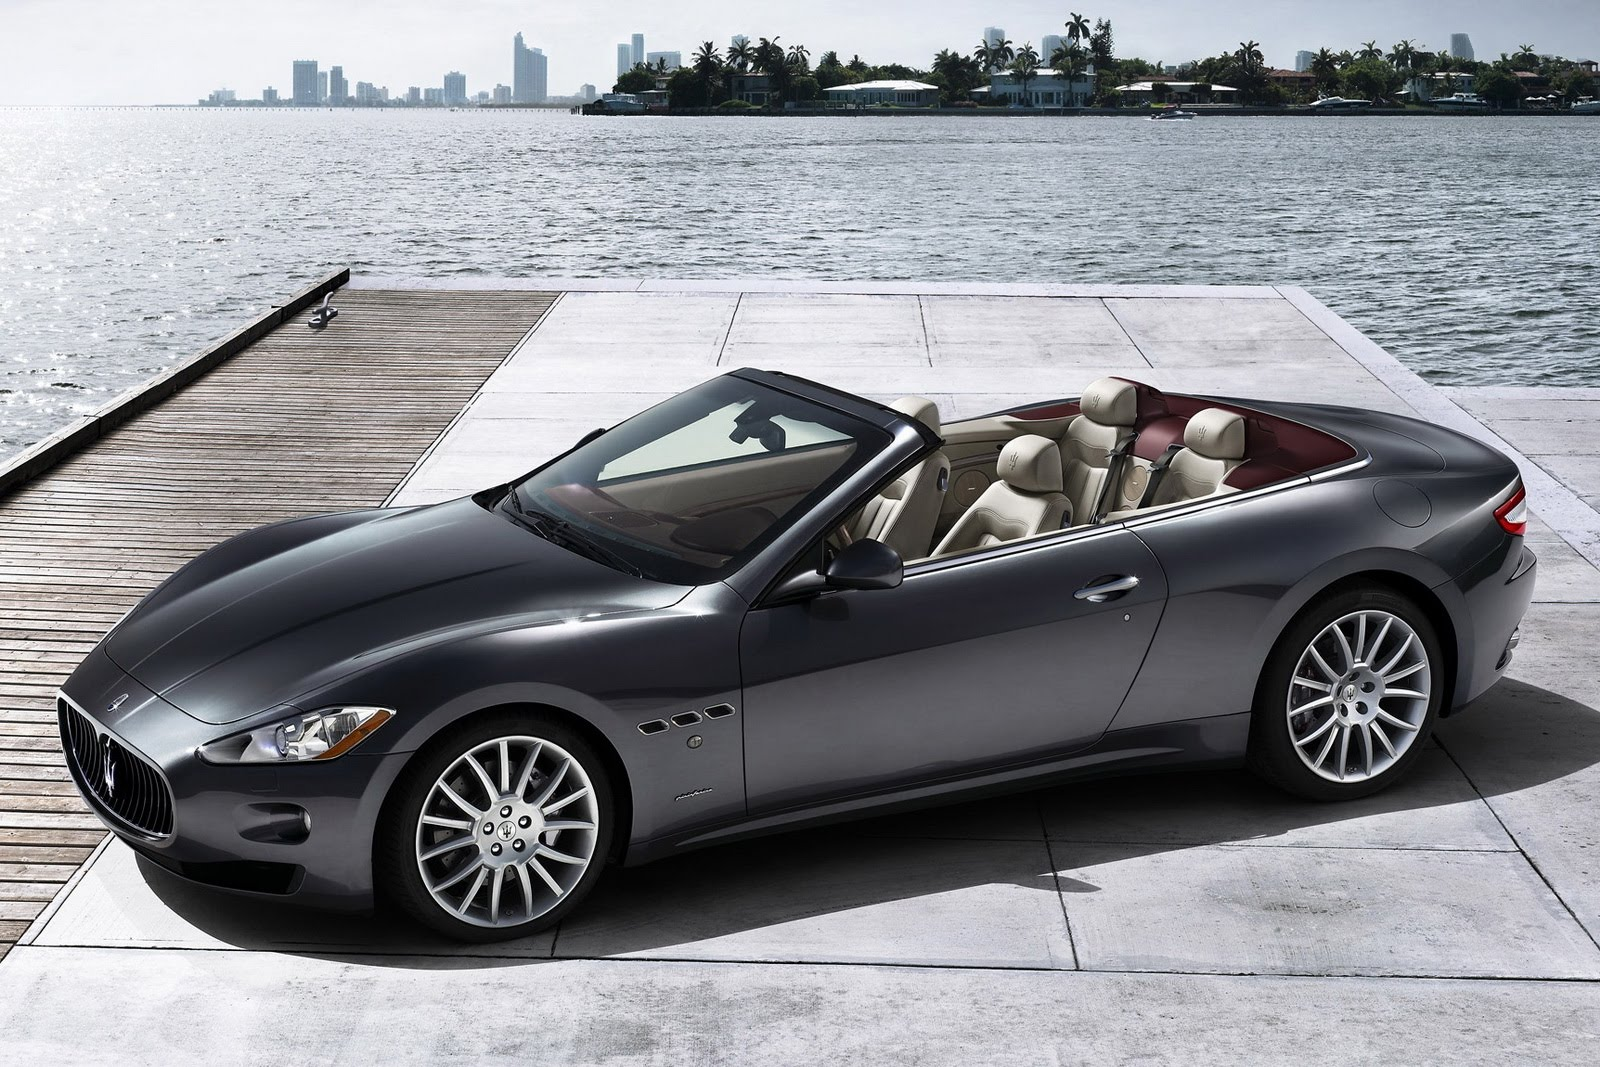 maserati grancabrio, location voiture luxe, week-end romantique, saint valentin, week-end, week-end romantique